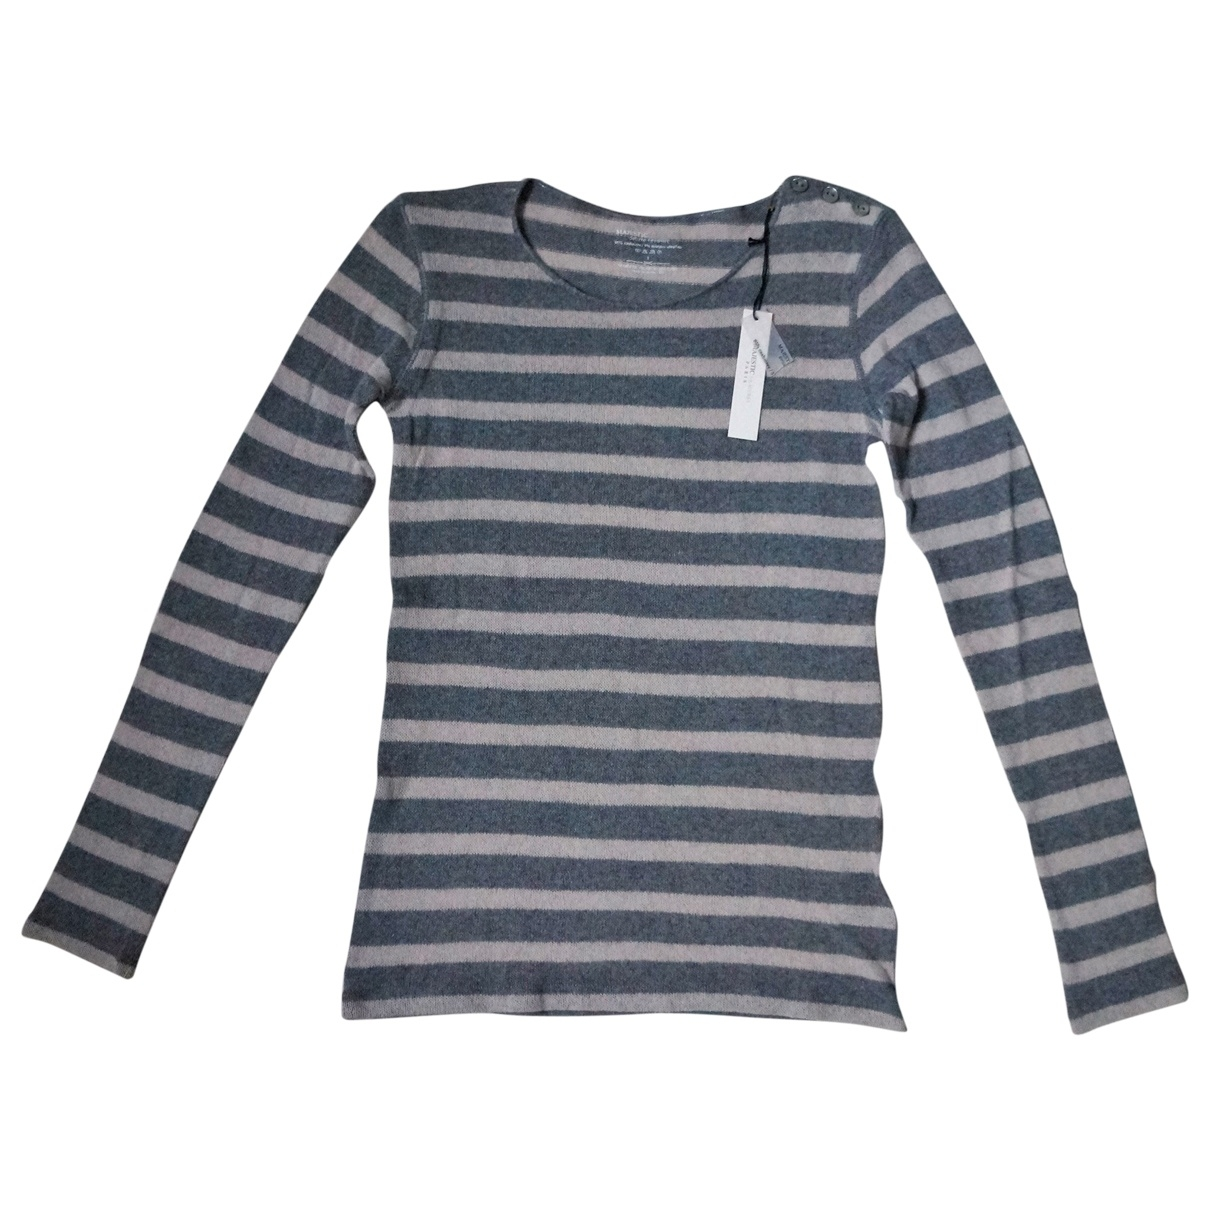 Majestic Filatures \N Grey Cashmere Knitwear for Women 1 0-5